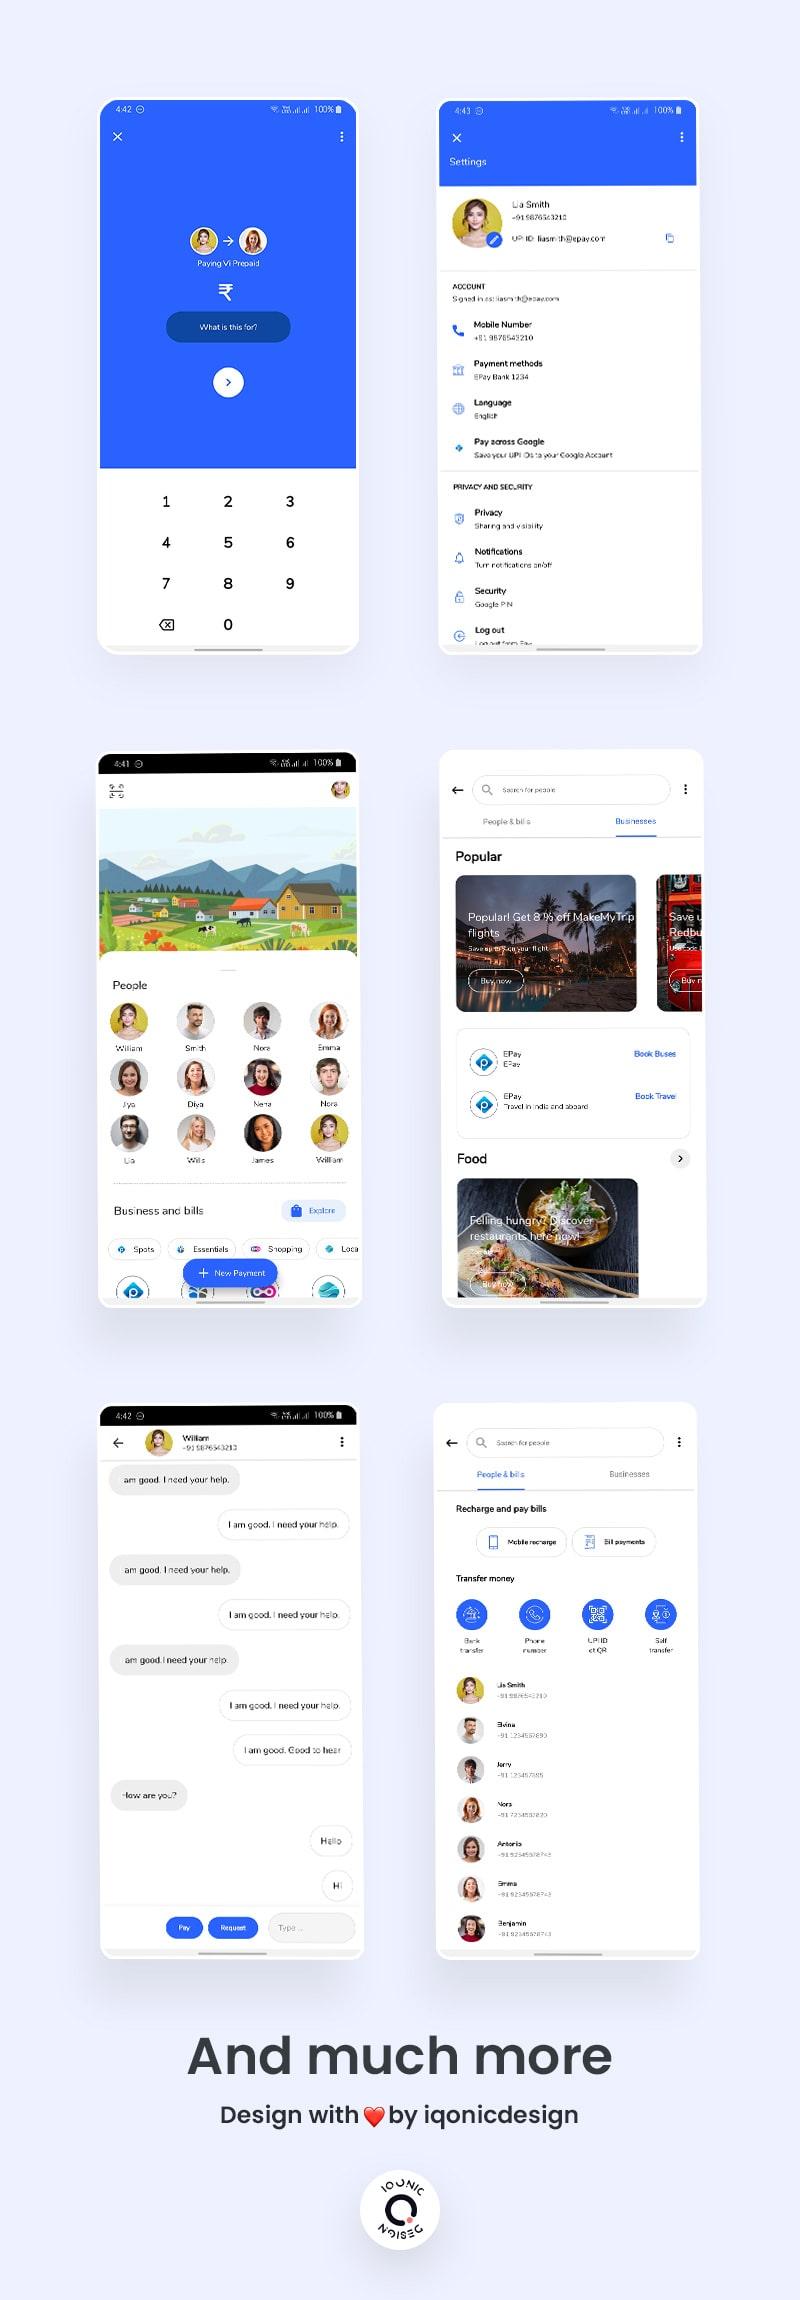 Free Google Pay Clone Flutter UI Kit | ePay | Iqonic Design free google pay clone flutter ui kit ePay Flutter 05 list epay min